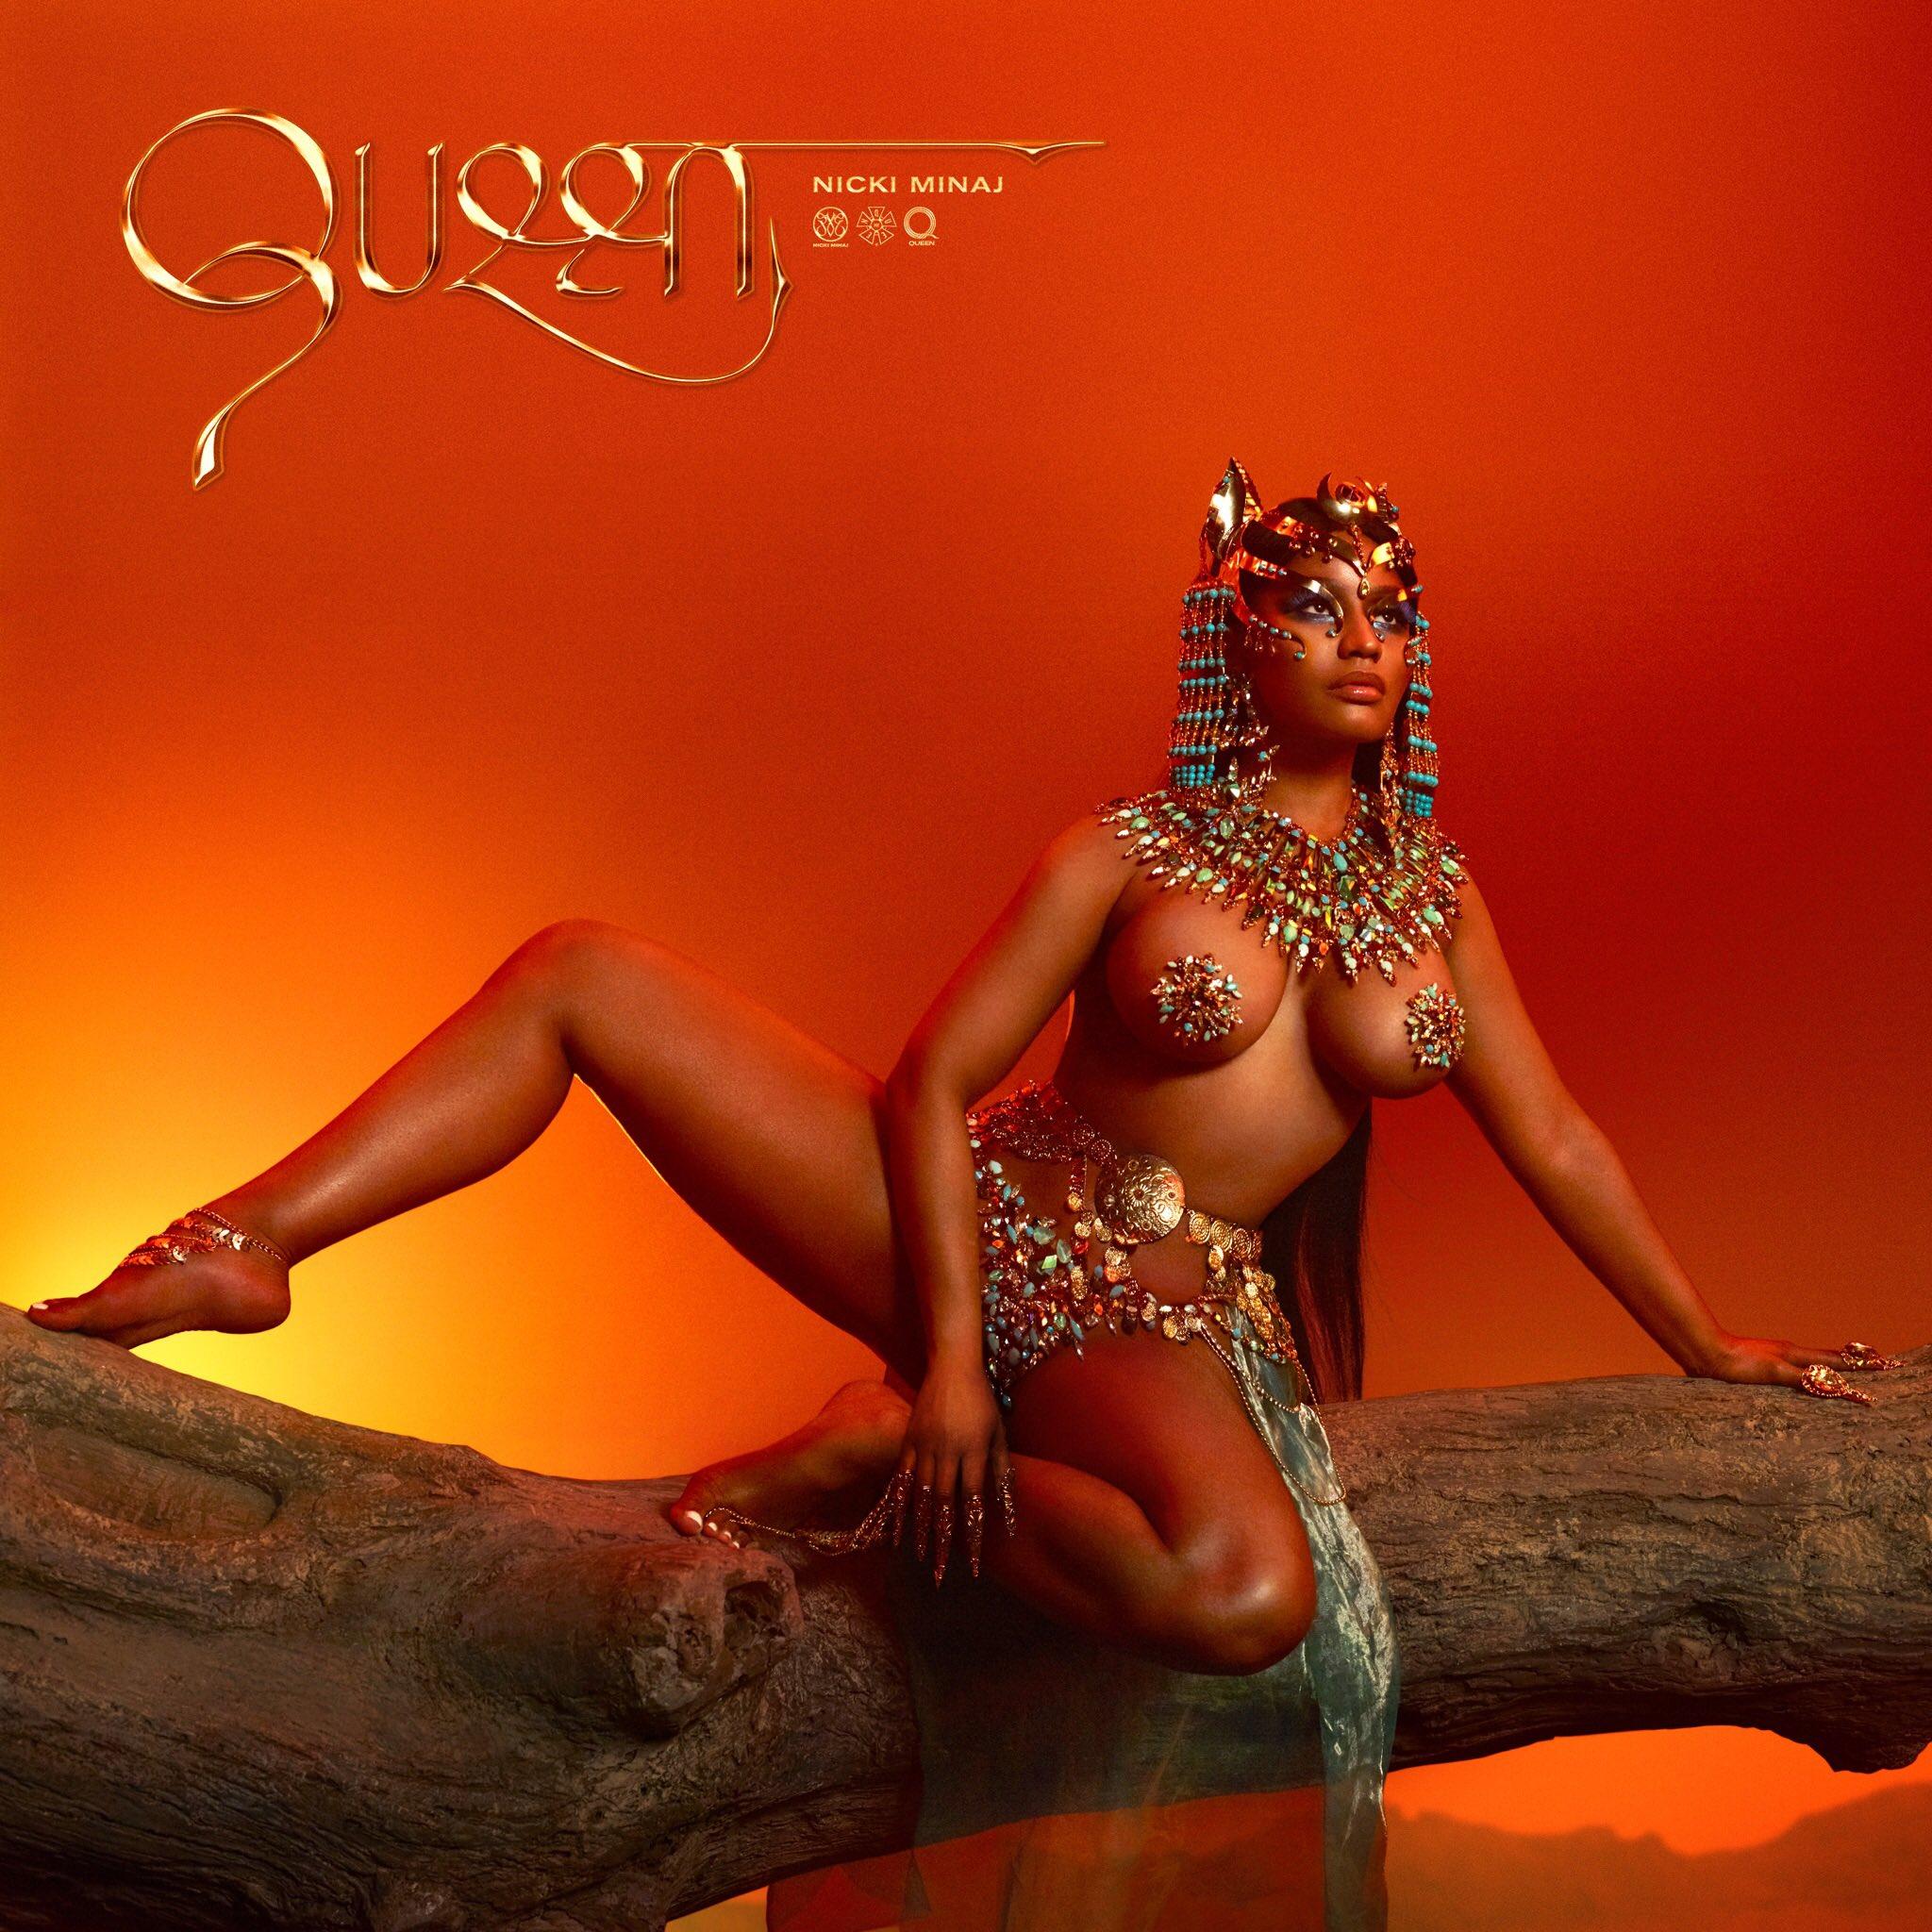 Queen album by Nicki Minaj 2018